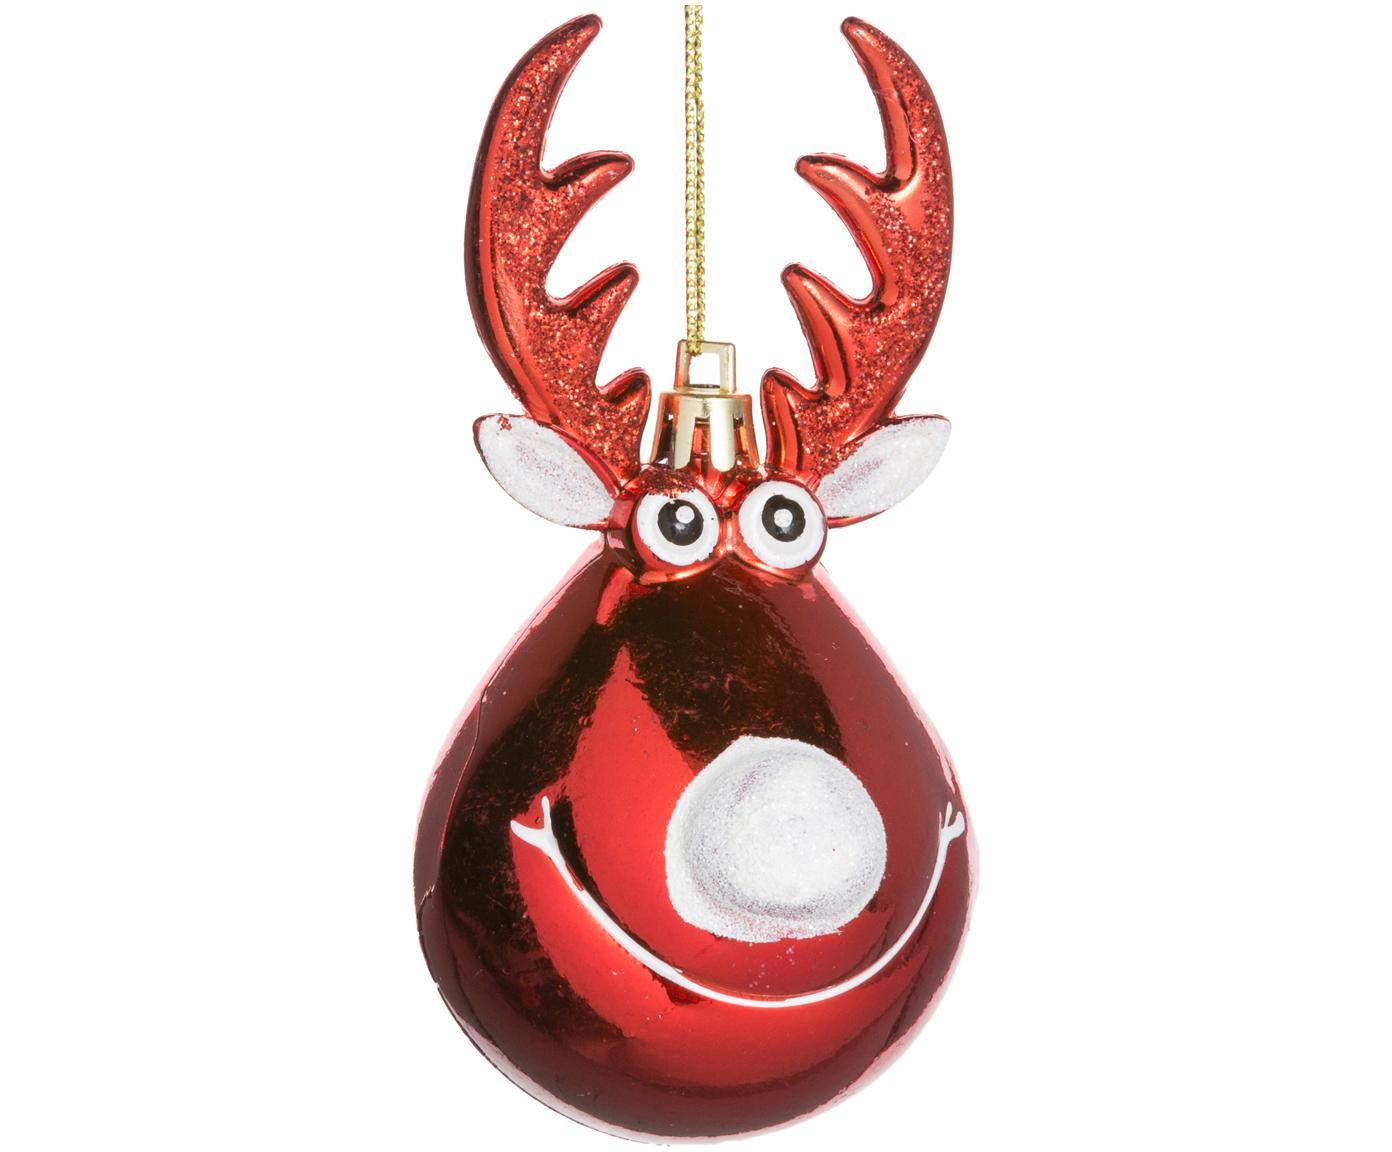 Baumanhänger Rudolph, 2 Stück, Kunststoff, Weihnachtsrot, Weiss, goldfarben, Ø 5 x H 12 cm